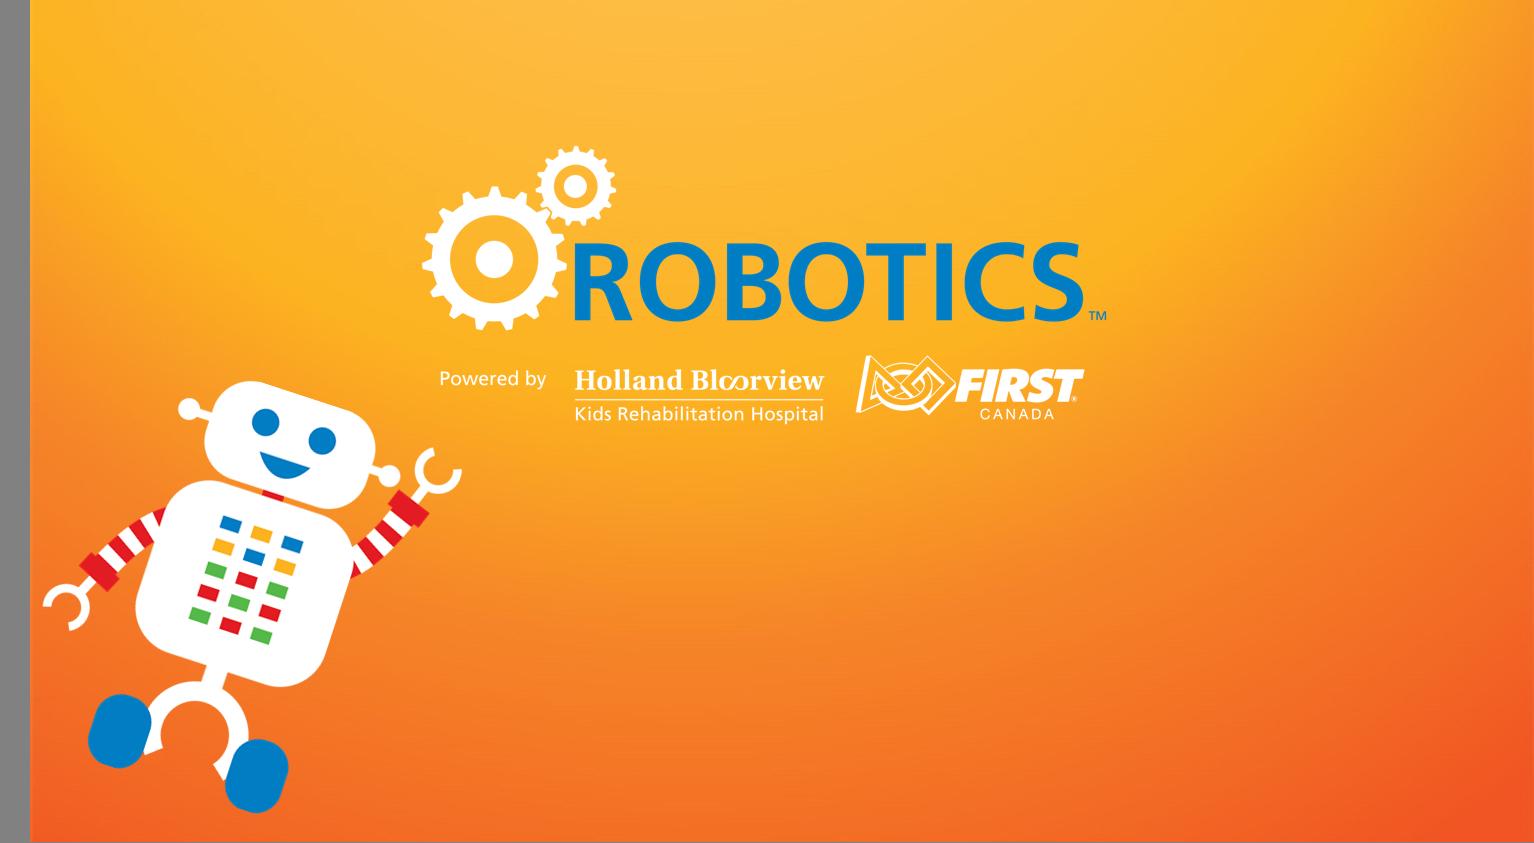 Spring 2020 Holland Bloorview FIRST Robotics - Junior Program